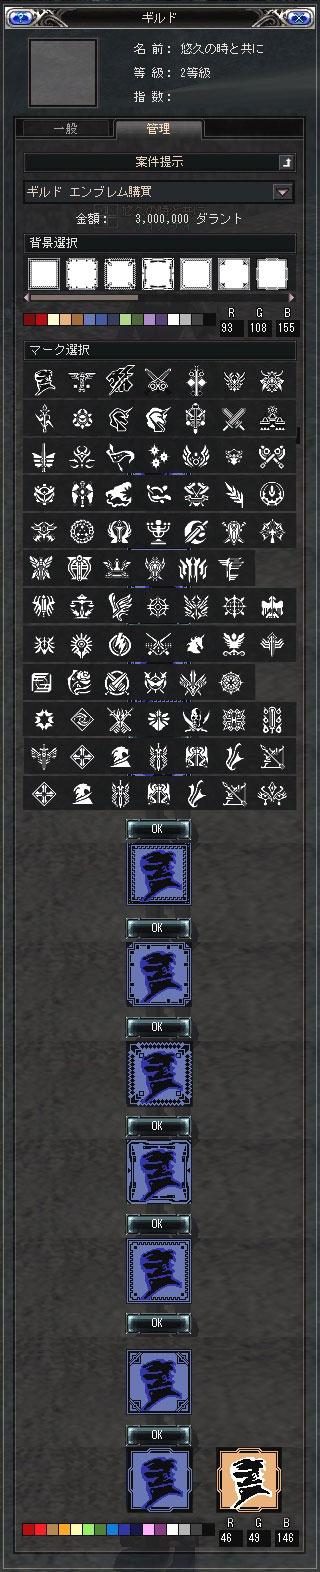 emblem_all.jpg